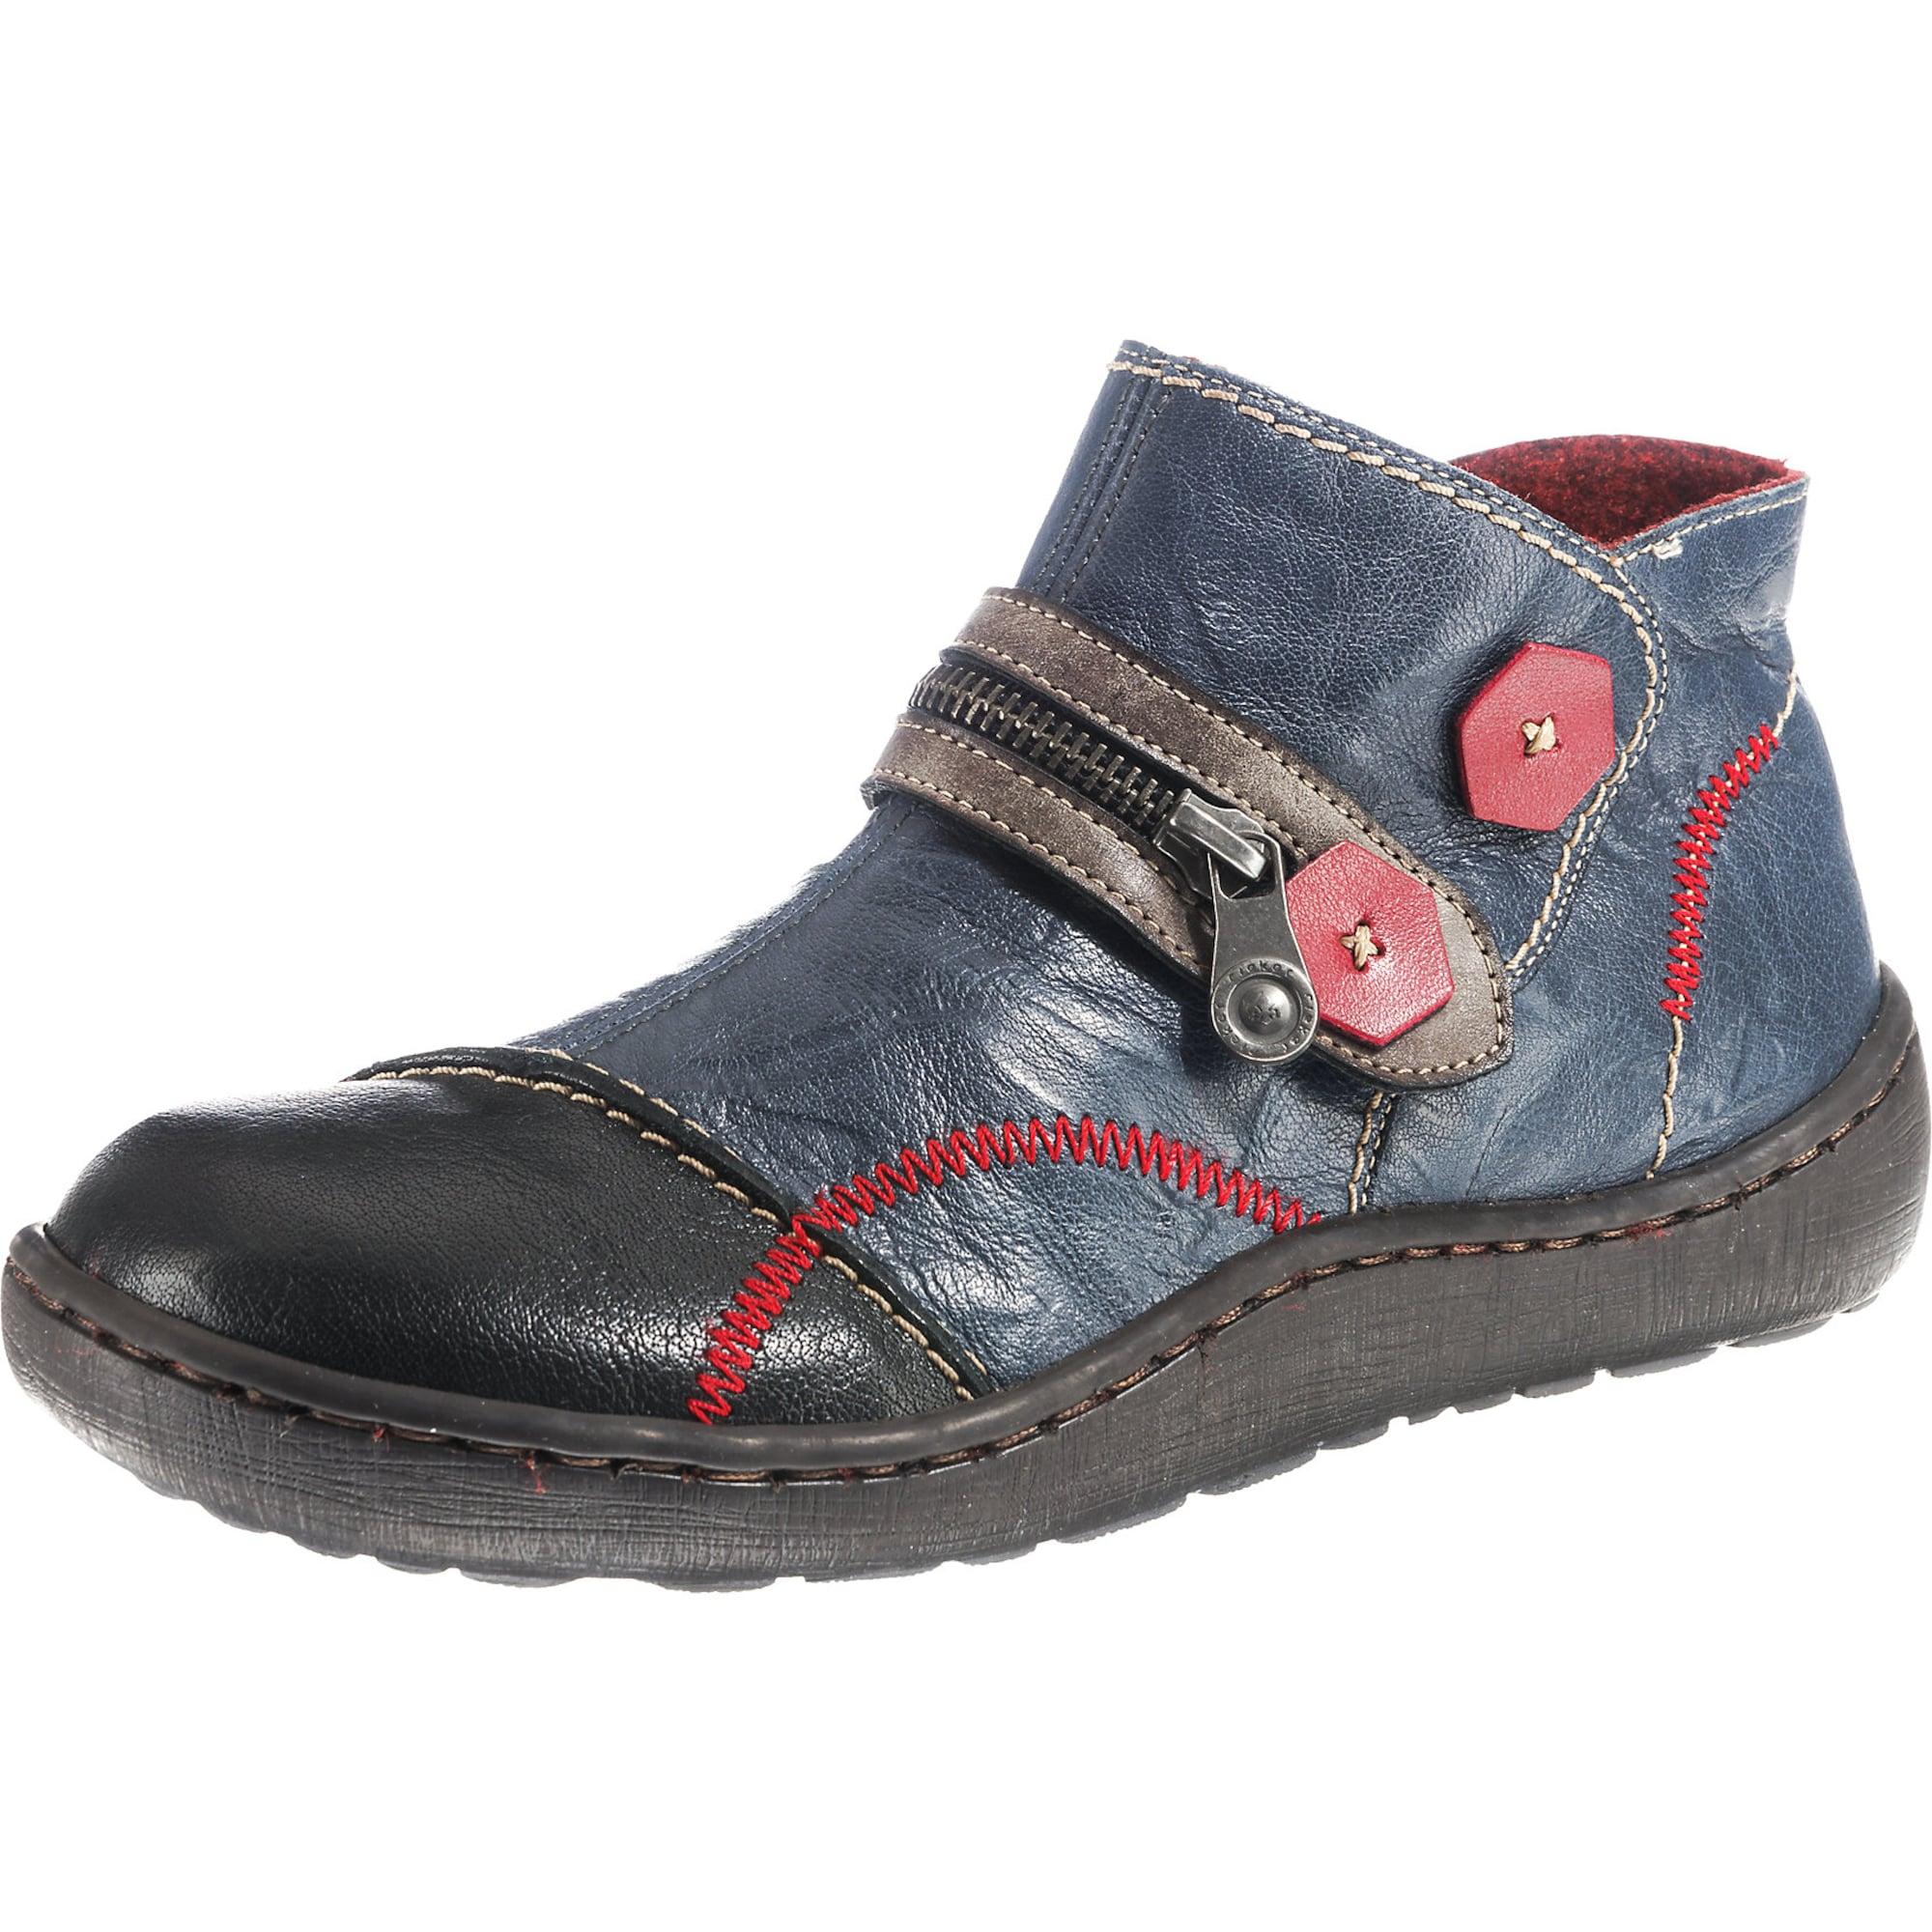 Sommerboots   Schuhe > Boots > Sommerboots   Rieker